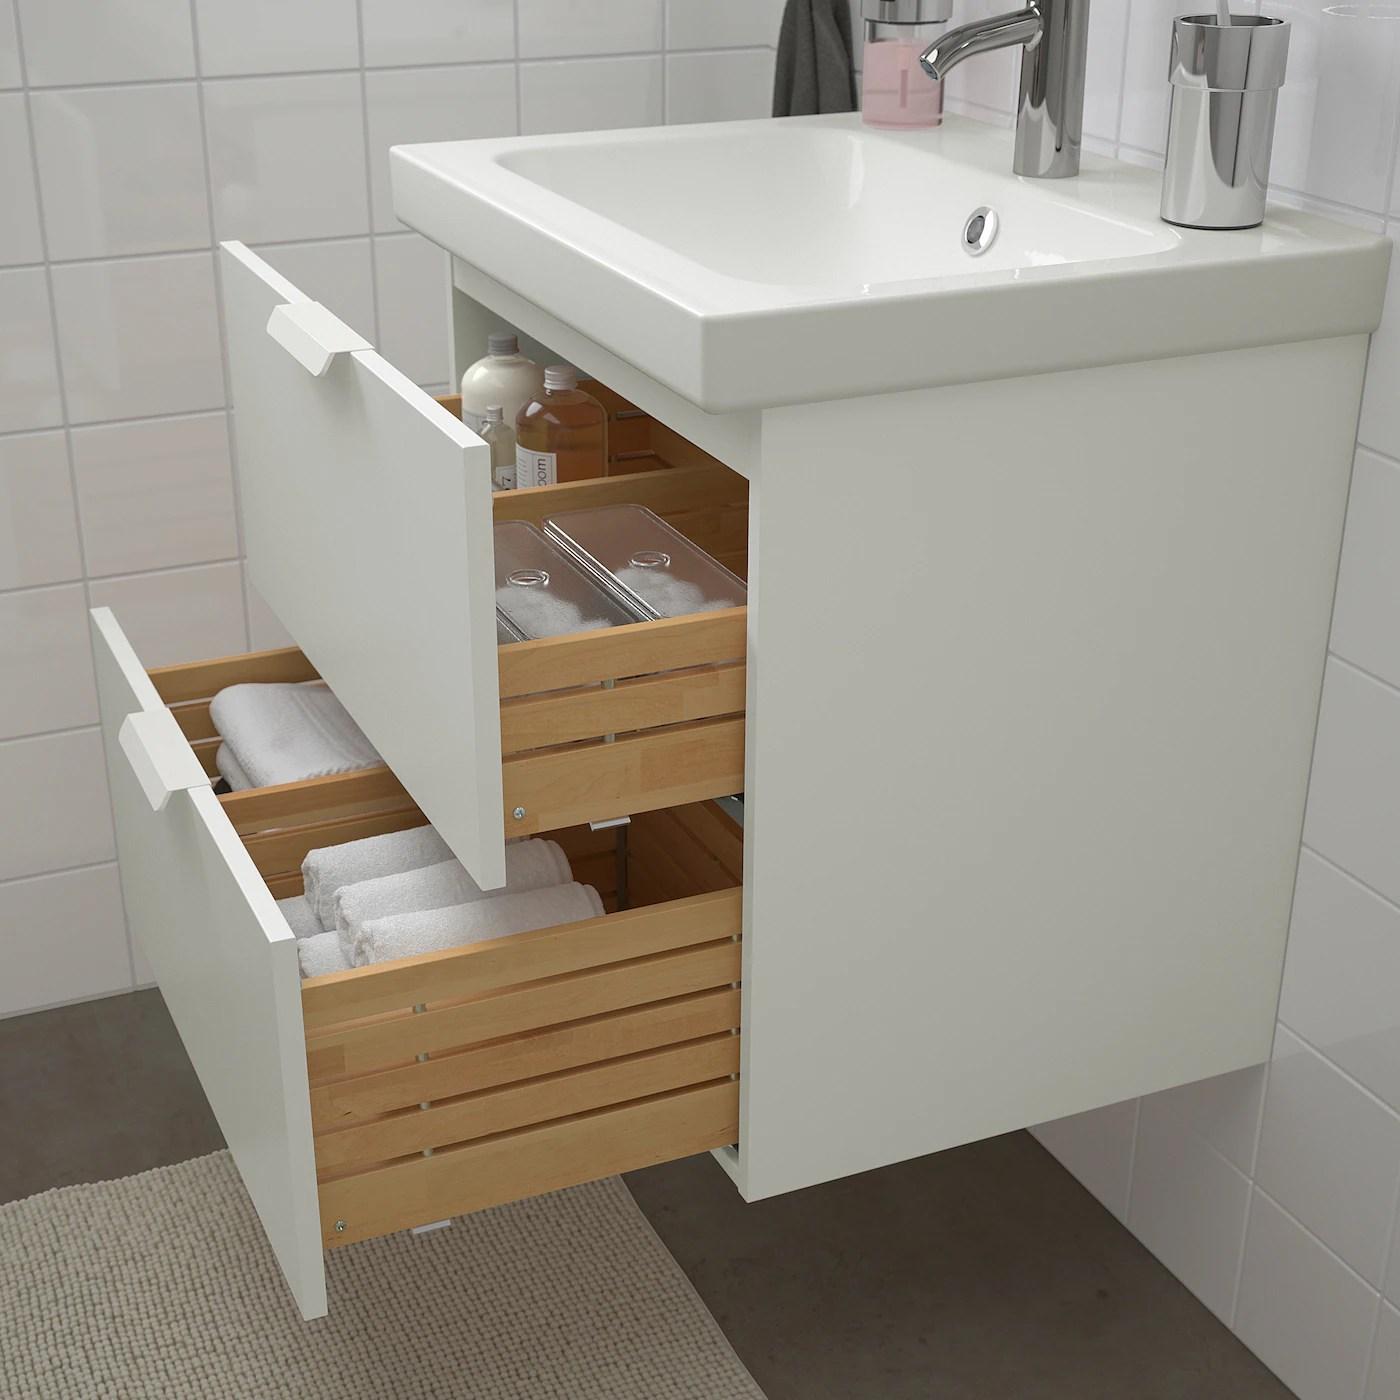 Godmorgon Odensvik Mobilier Salle De Bain 4 Pieces Blanc Dalskar Mitigeur Lavabo 63 Cm Ikea